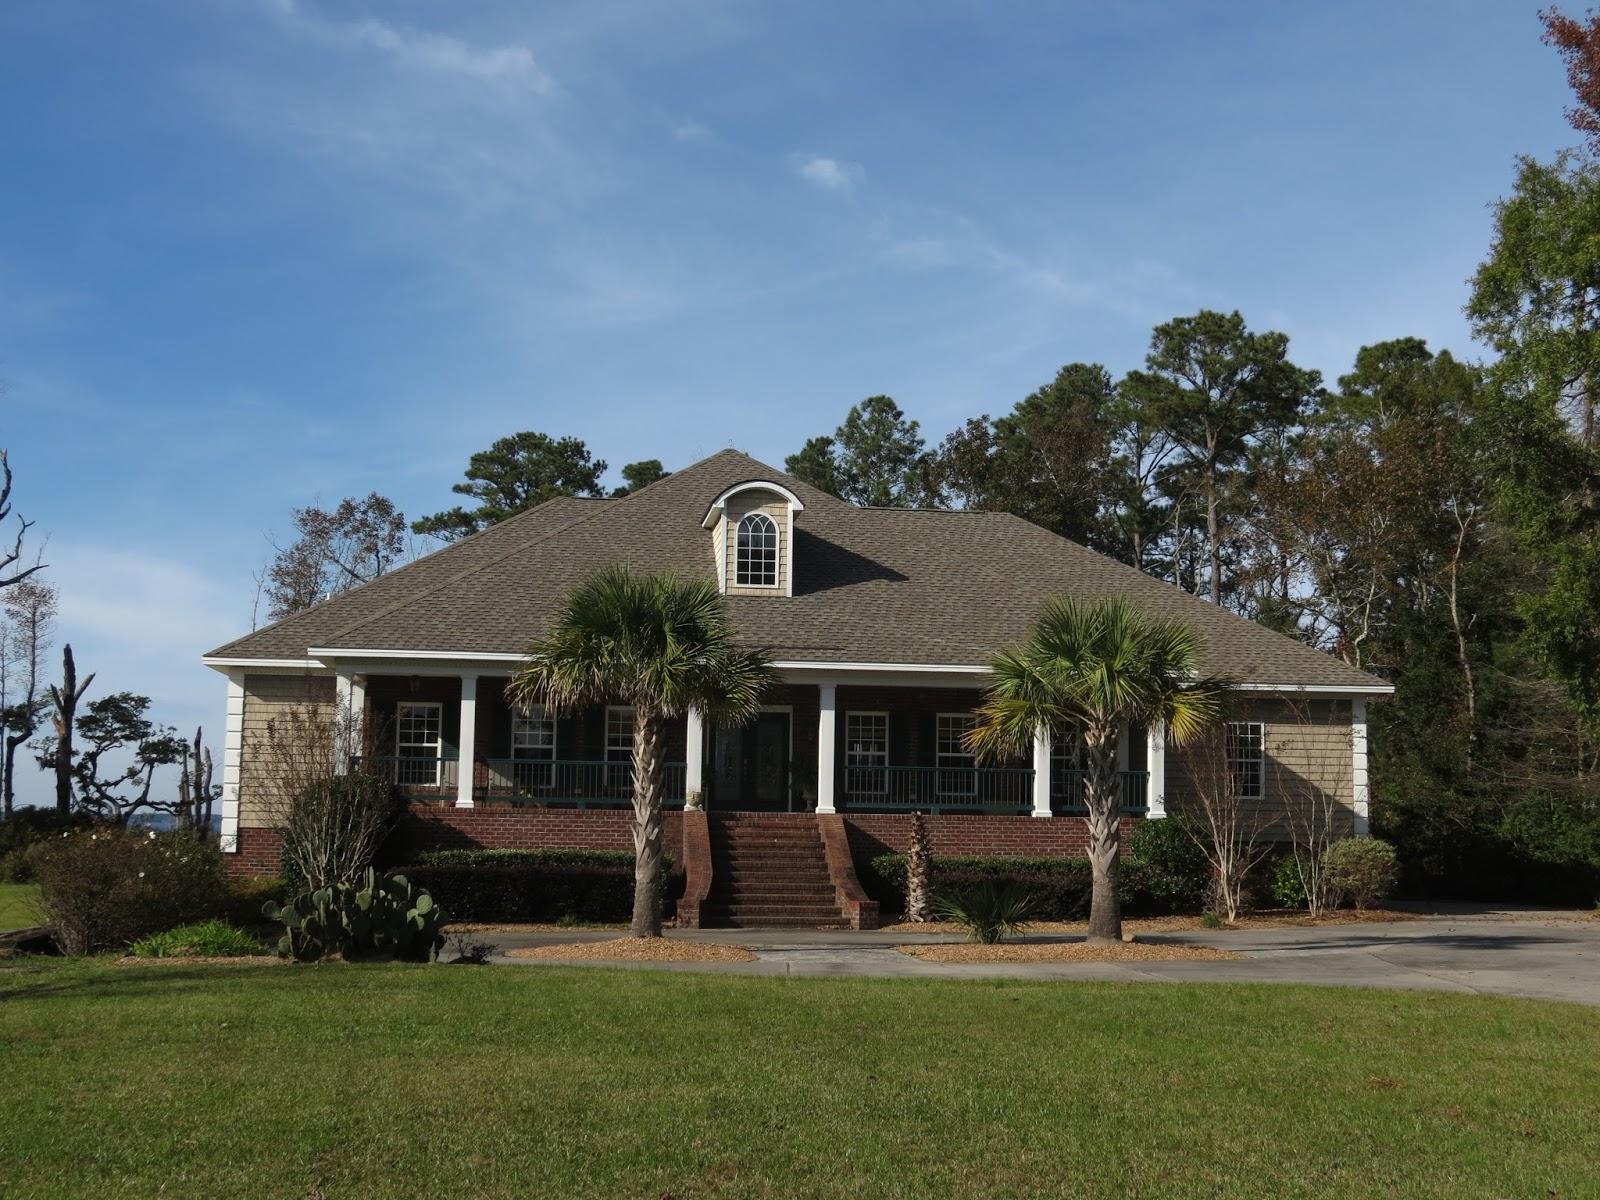 New bern nc real estate by sonja babic for Custom homes new bern nc